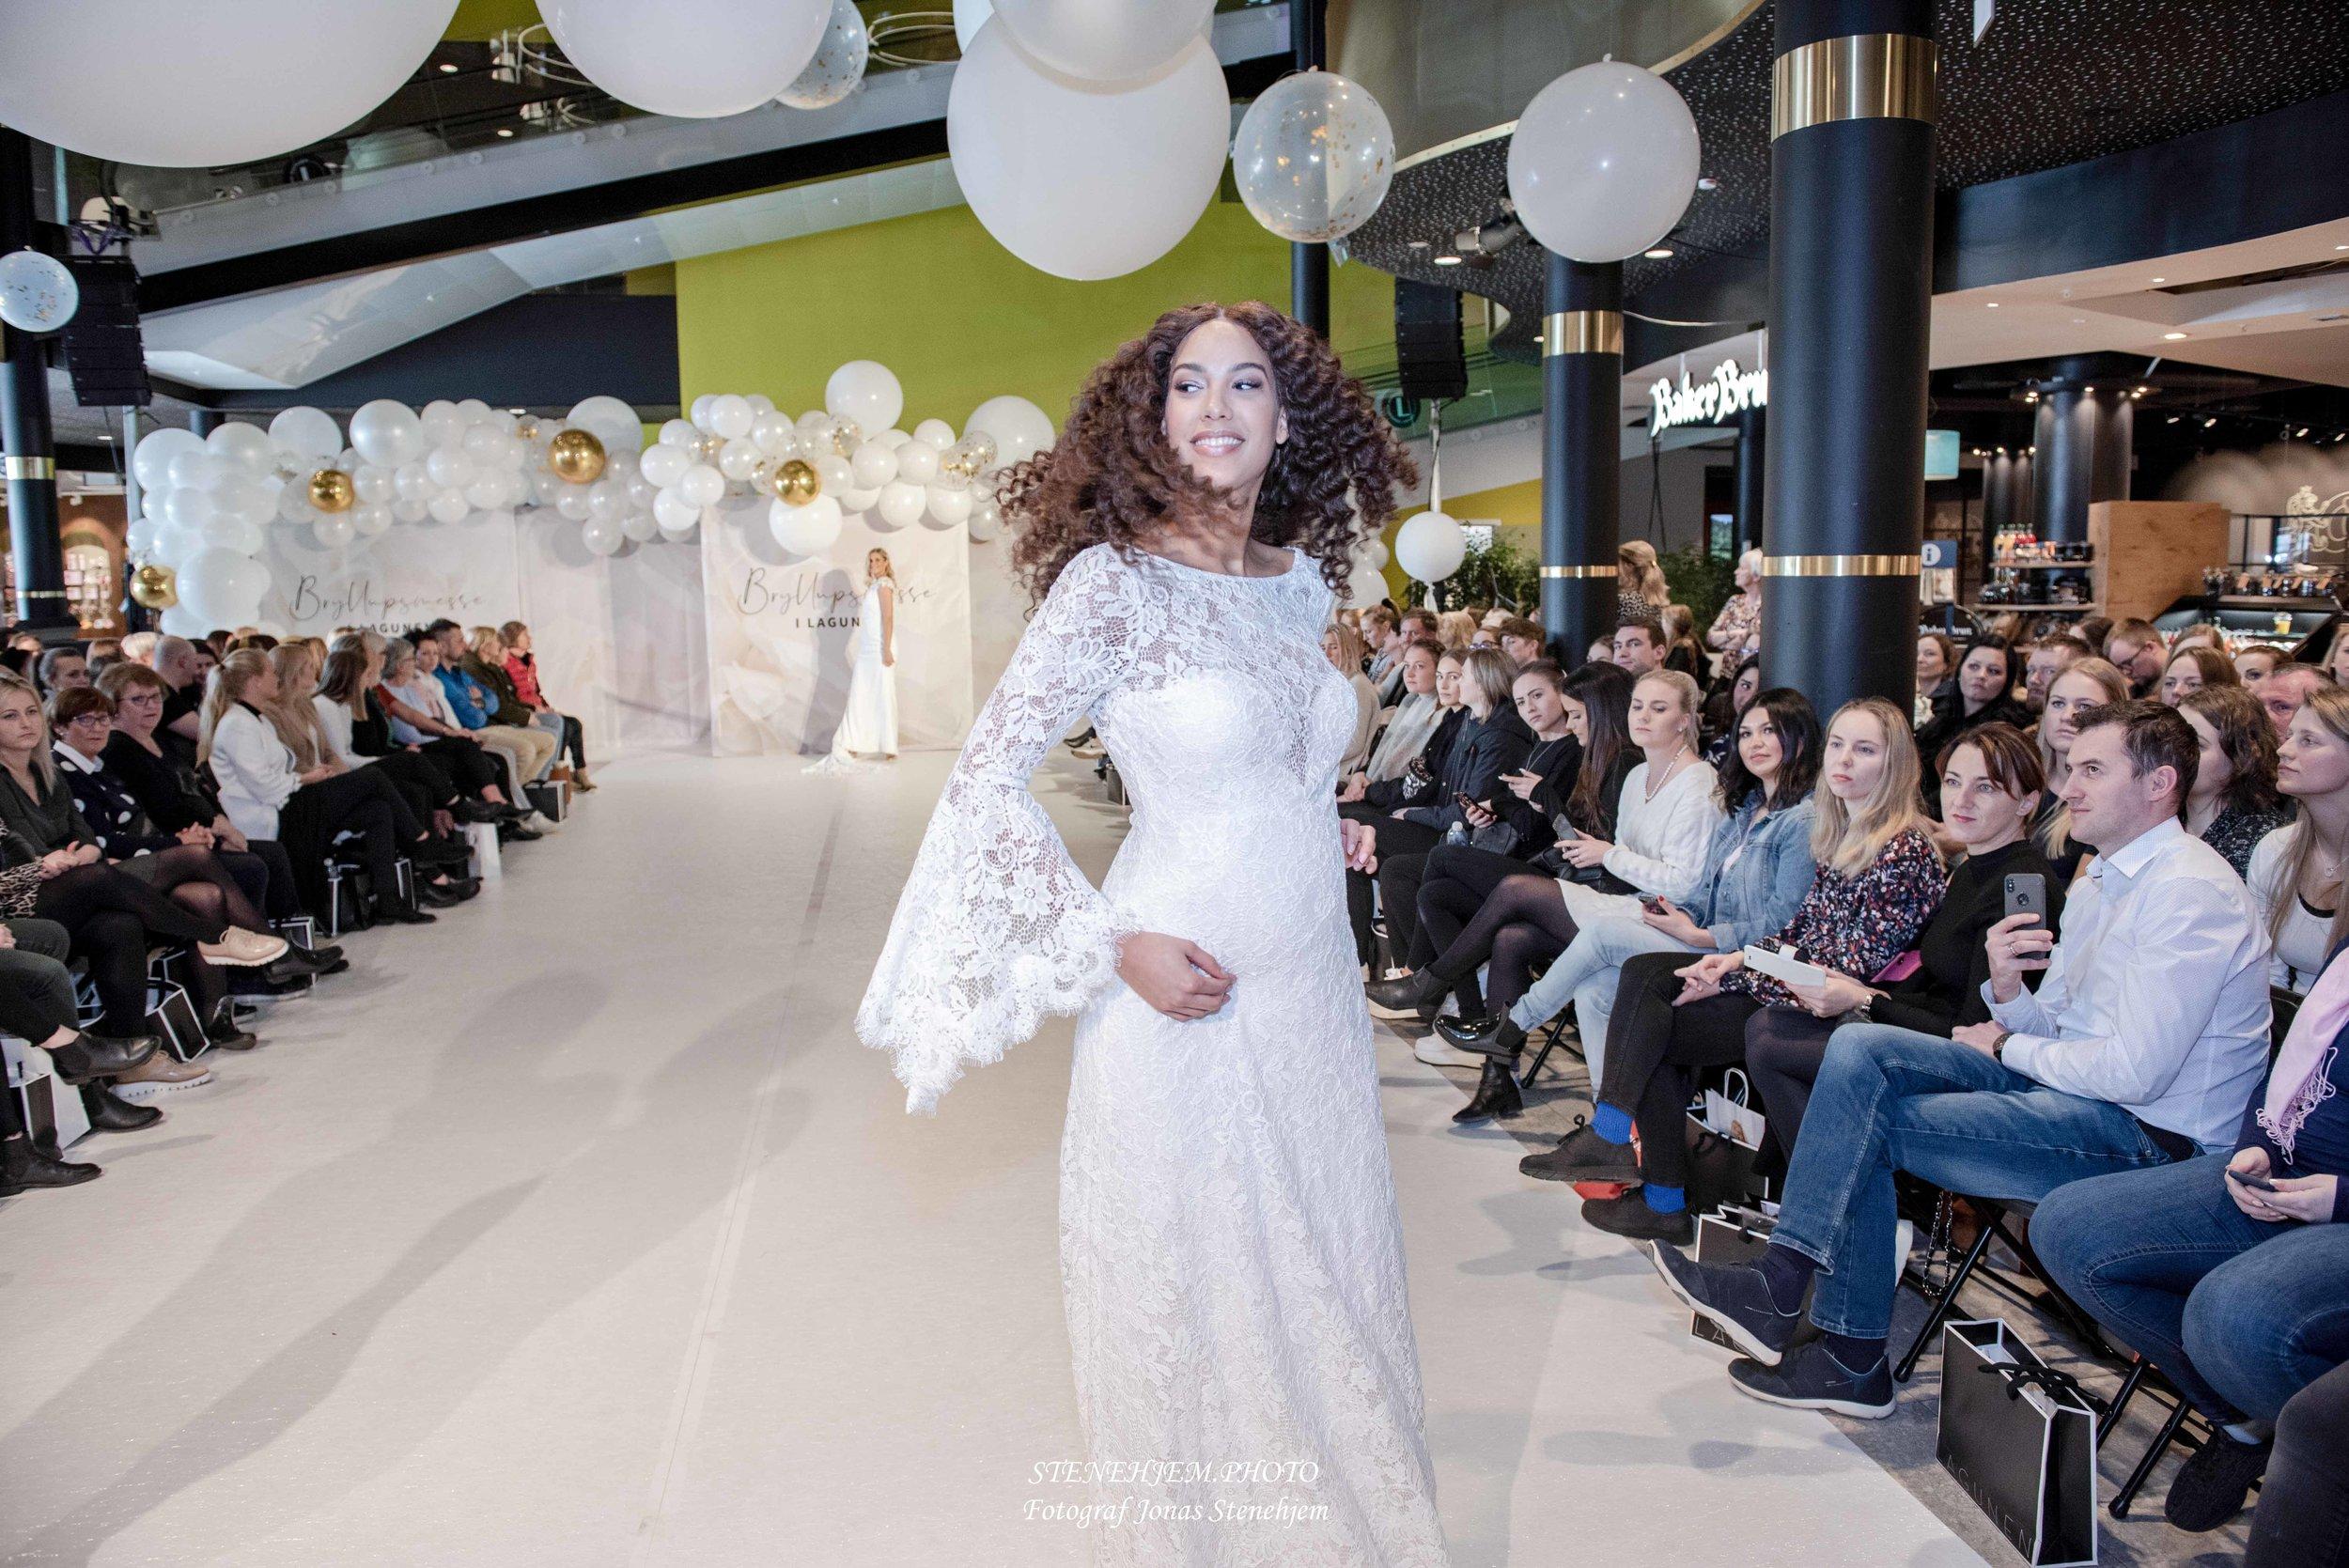 Bryllupsmesse_Lagunen_mittaltweddingfair__076.jpg